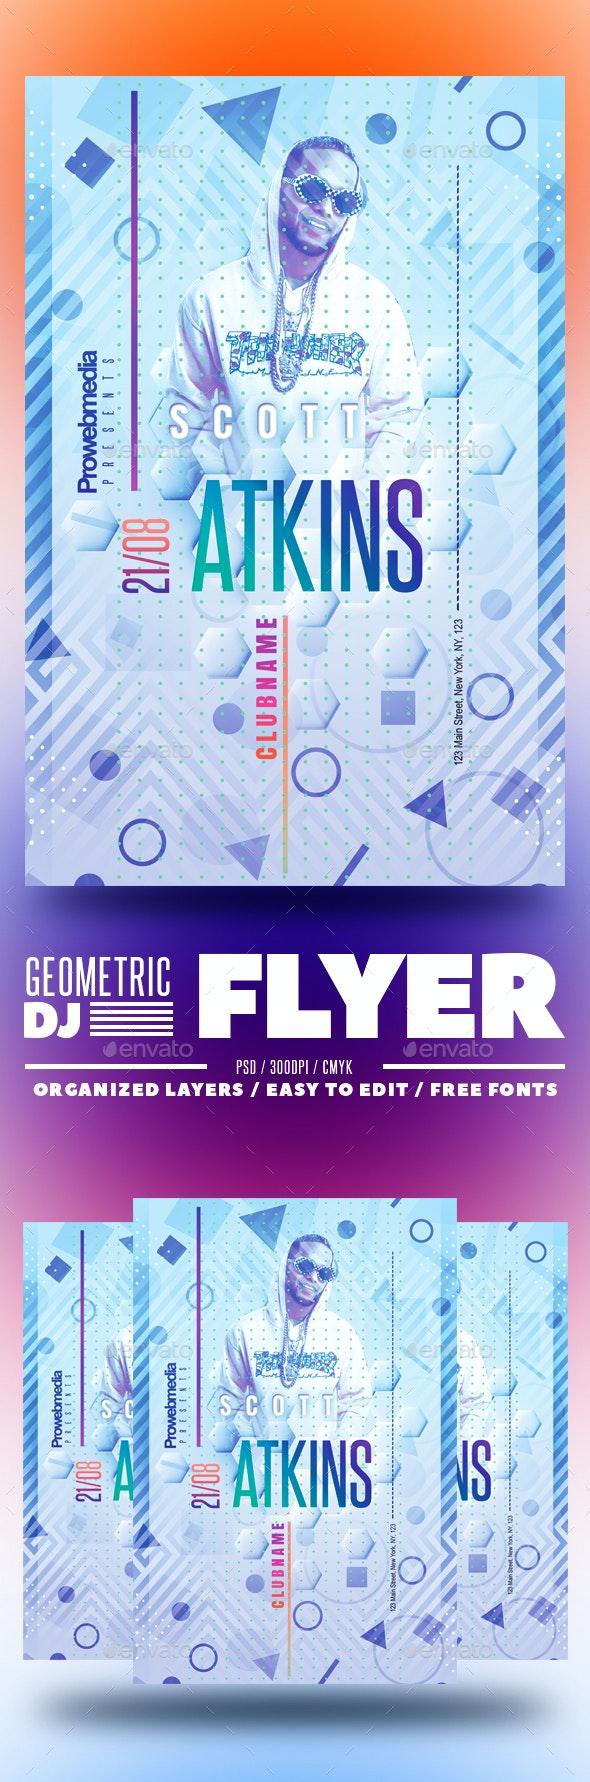 Geometric DJ Flyer - Clubs & Parties Events